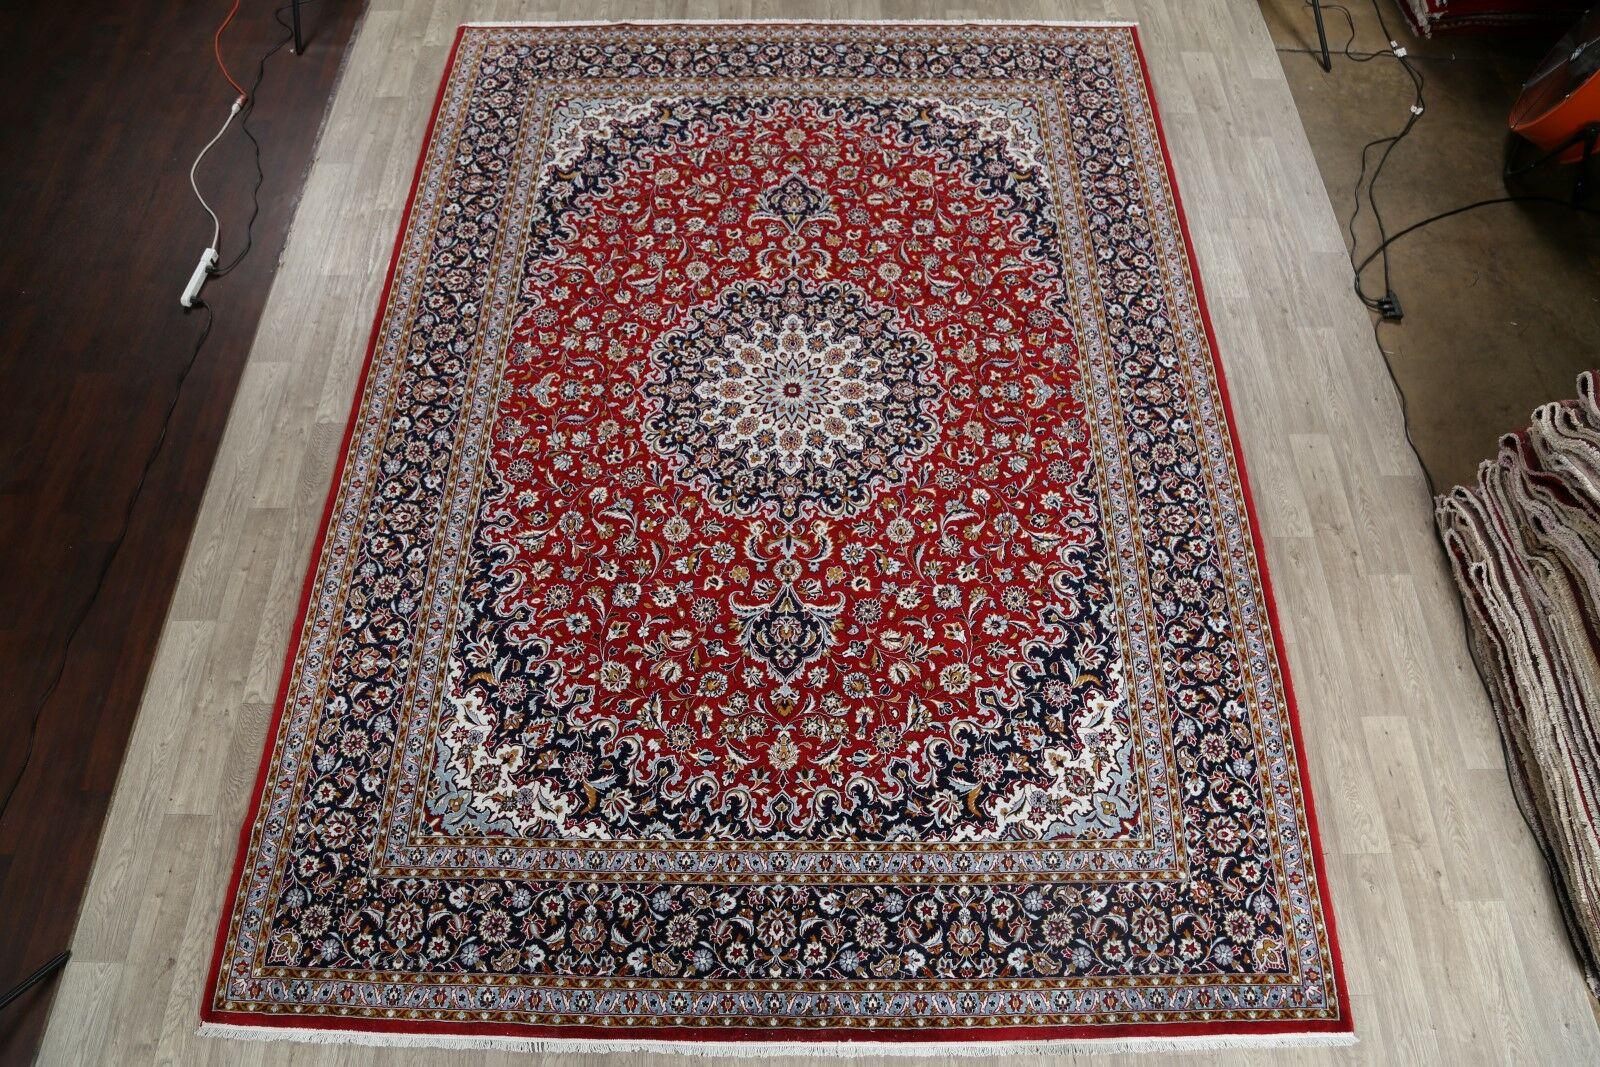 Noonan Soft Plush Floral Kerman Persian Navy Blue/Red/Beige Area Rug